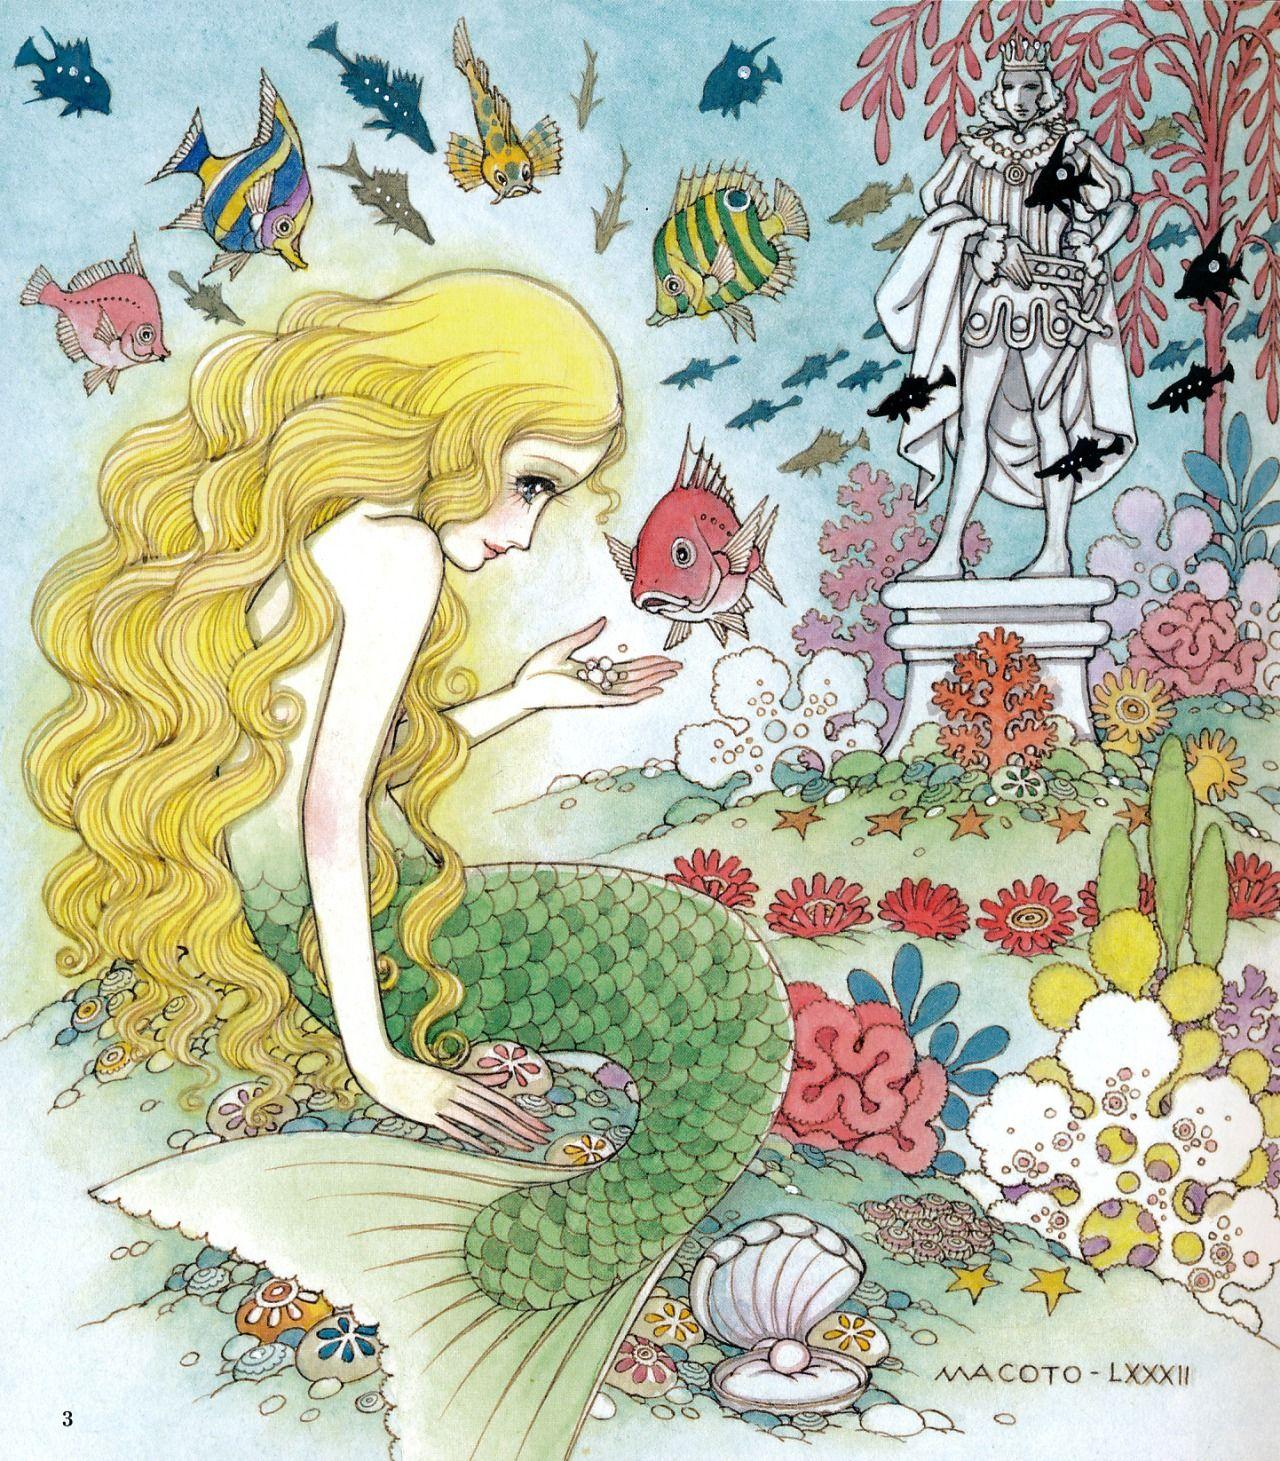 macoto takahashi quotthe little mermaidquot my scan makoto